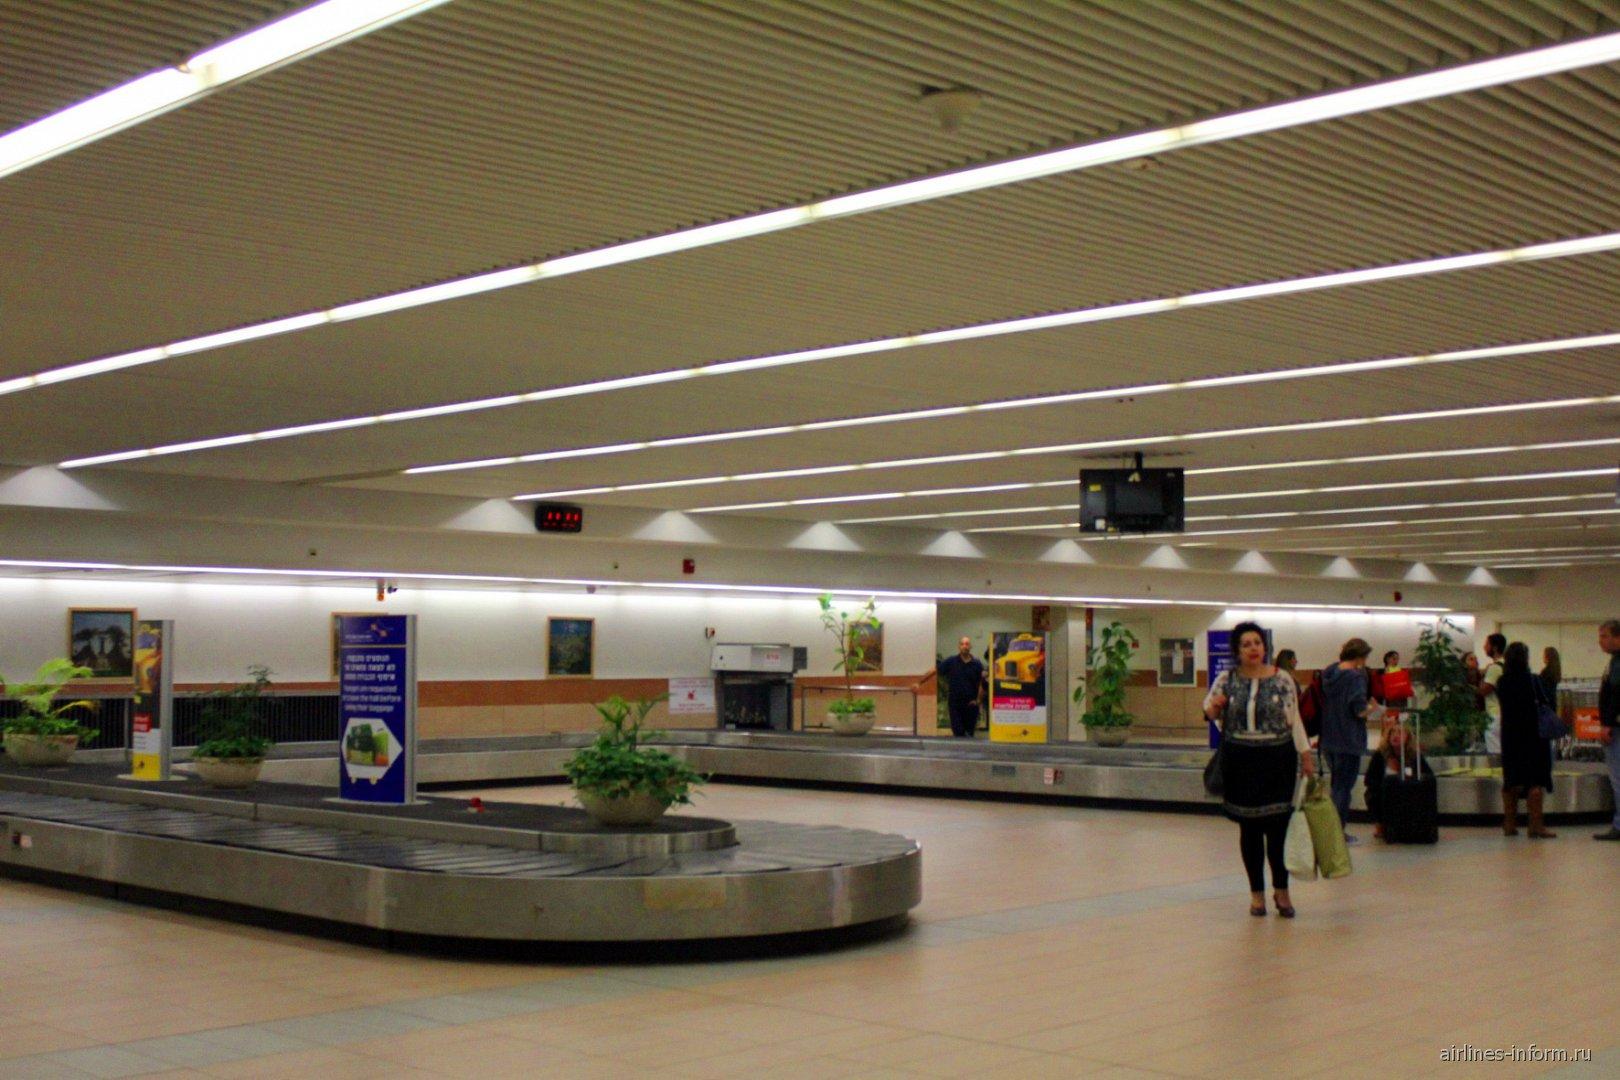 Зал выдачи багажа в терминале 1 аэропорта Тель-Авив Бен-Гурион